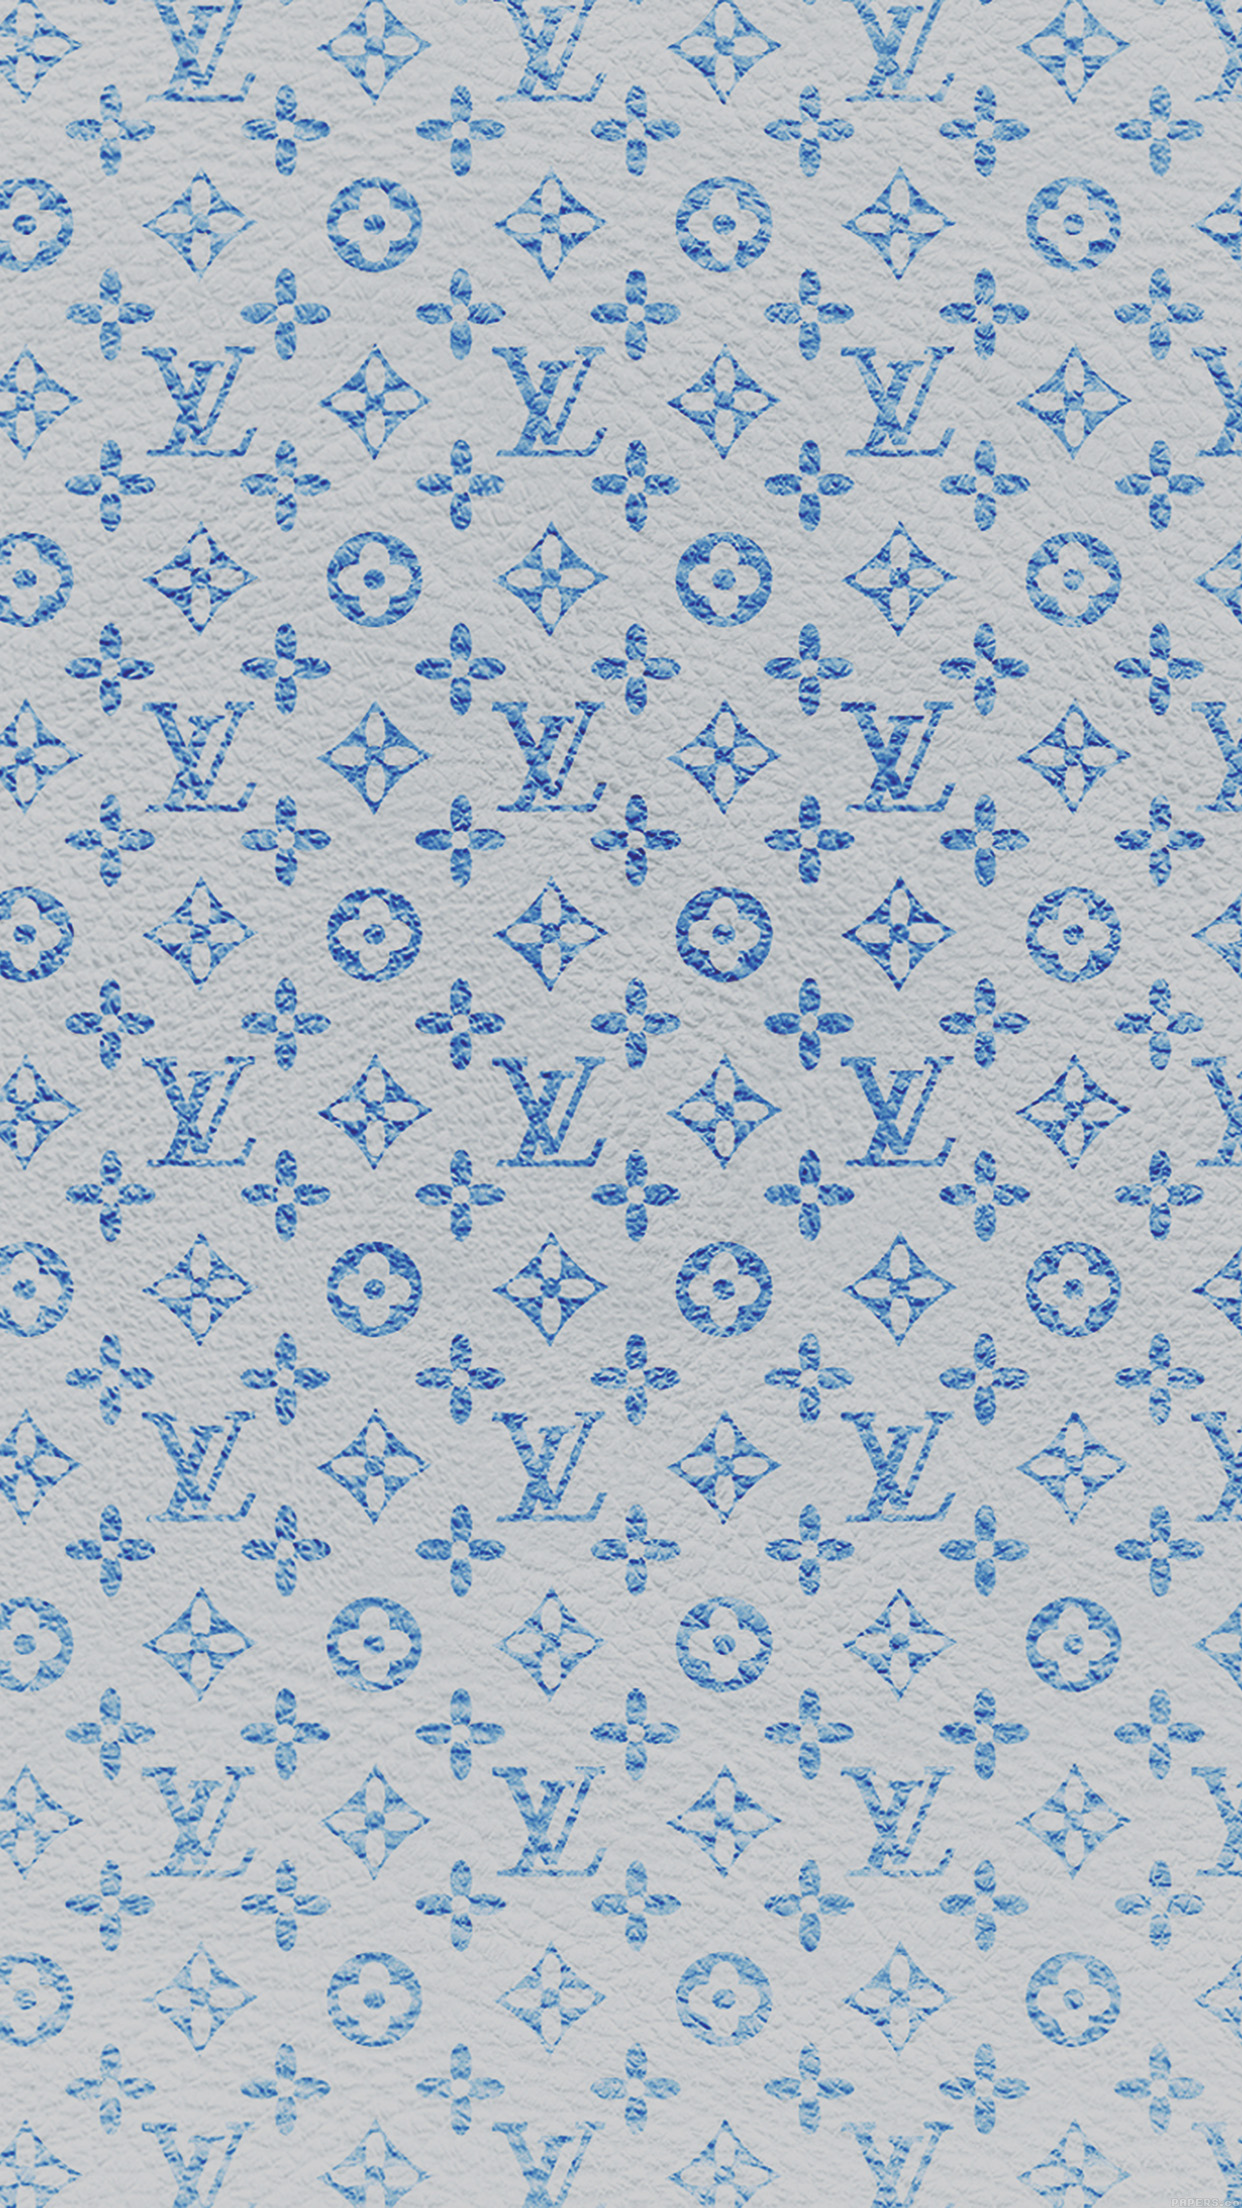 Iphonexpapers Vf21 Louis Vuitton Blue Pattern Art